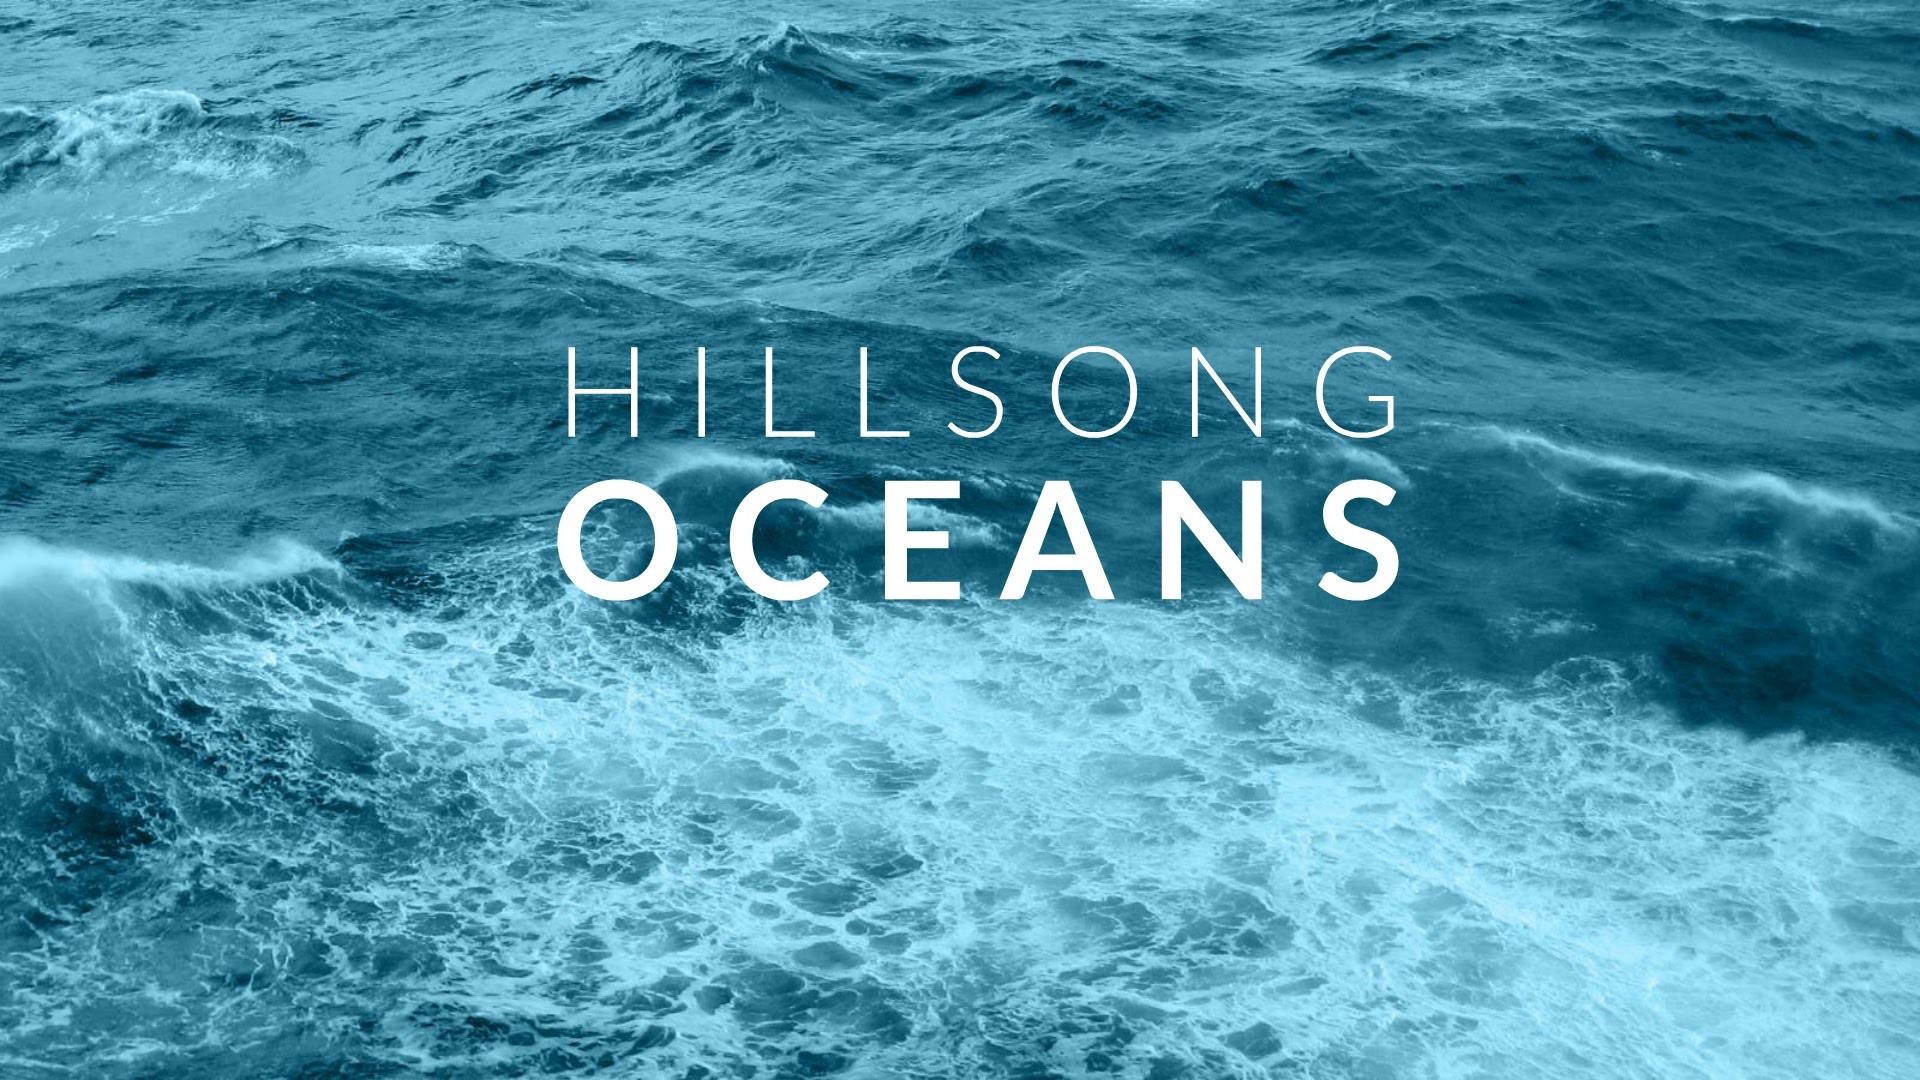 Oceans Hillsong Wallpaper (66+ images)